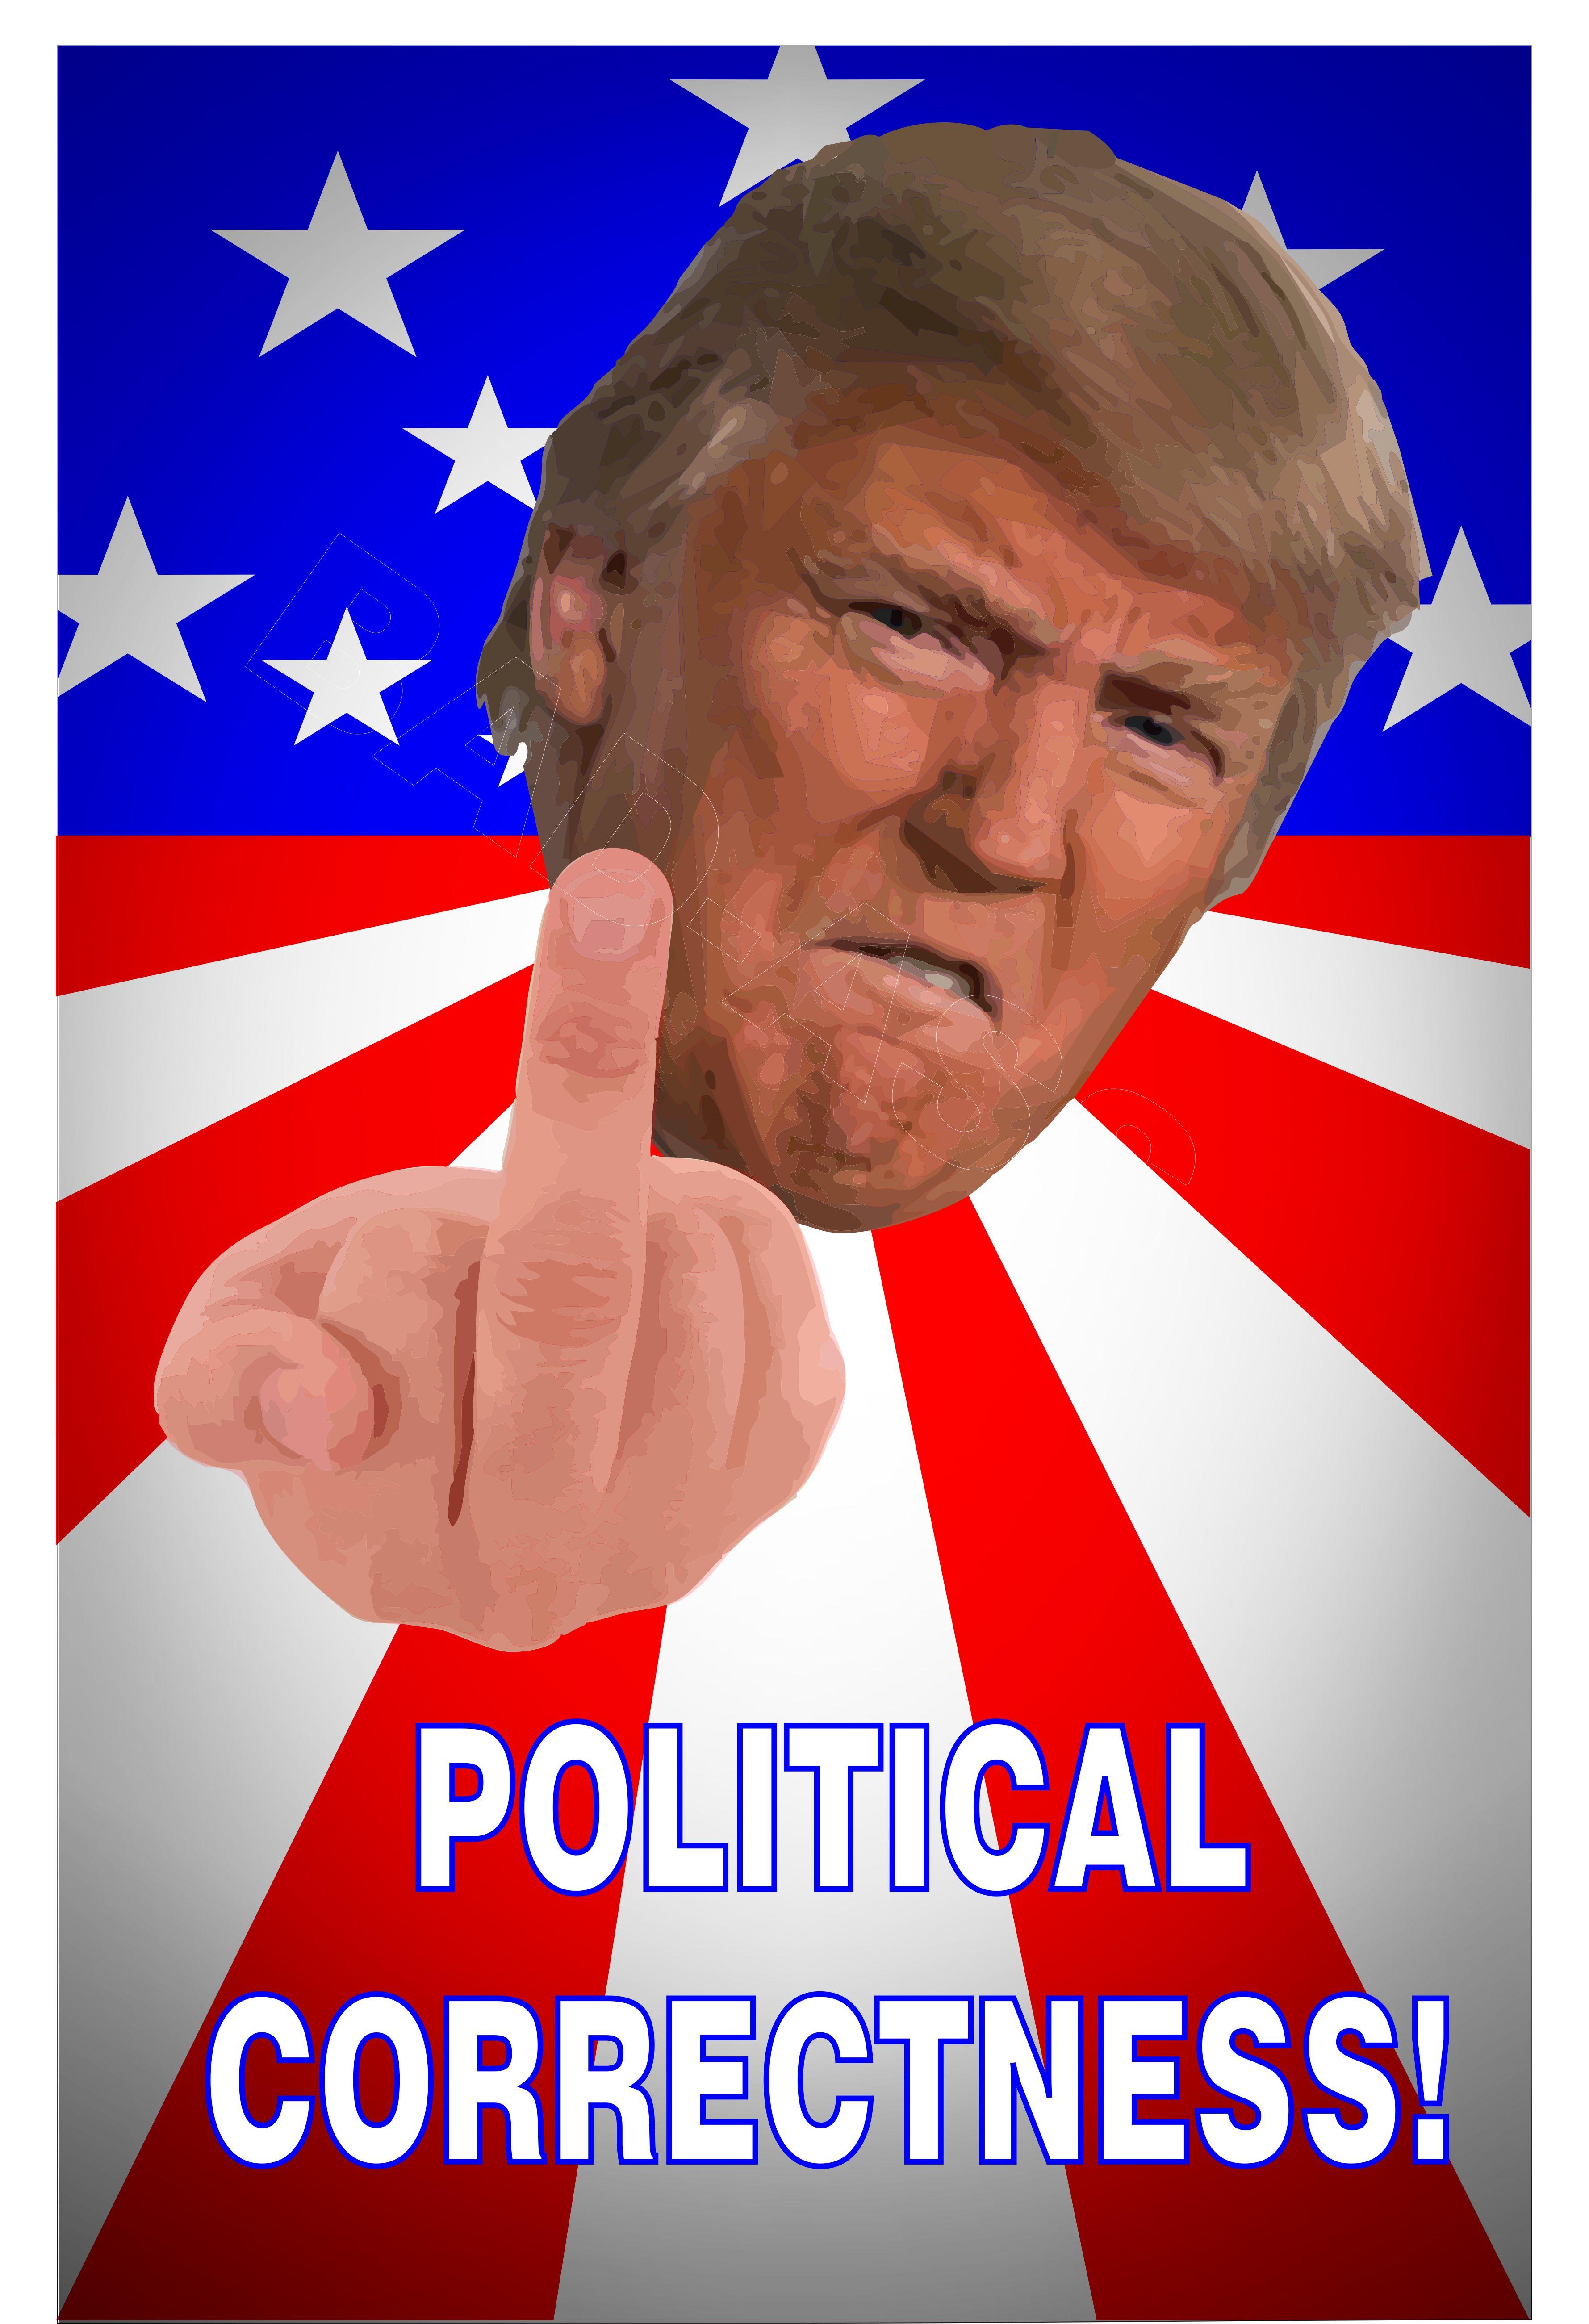 TrumpCorrectness